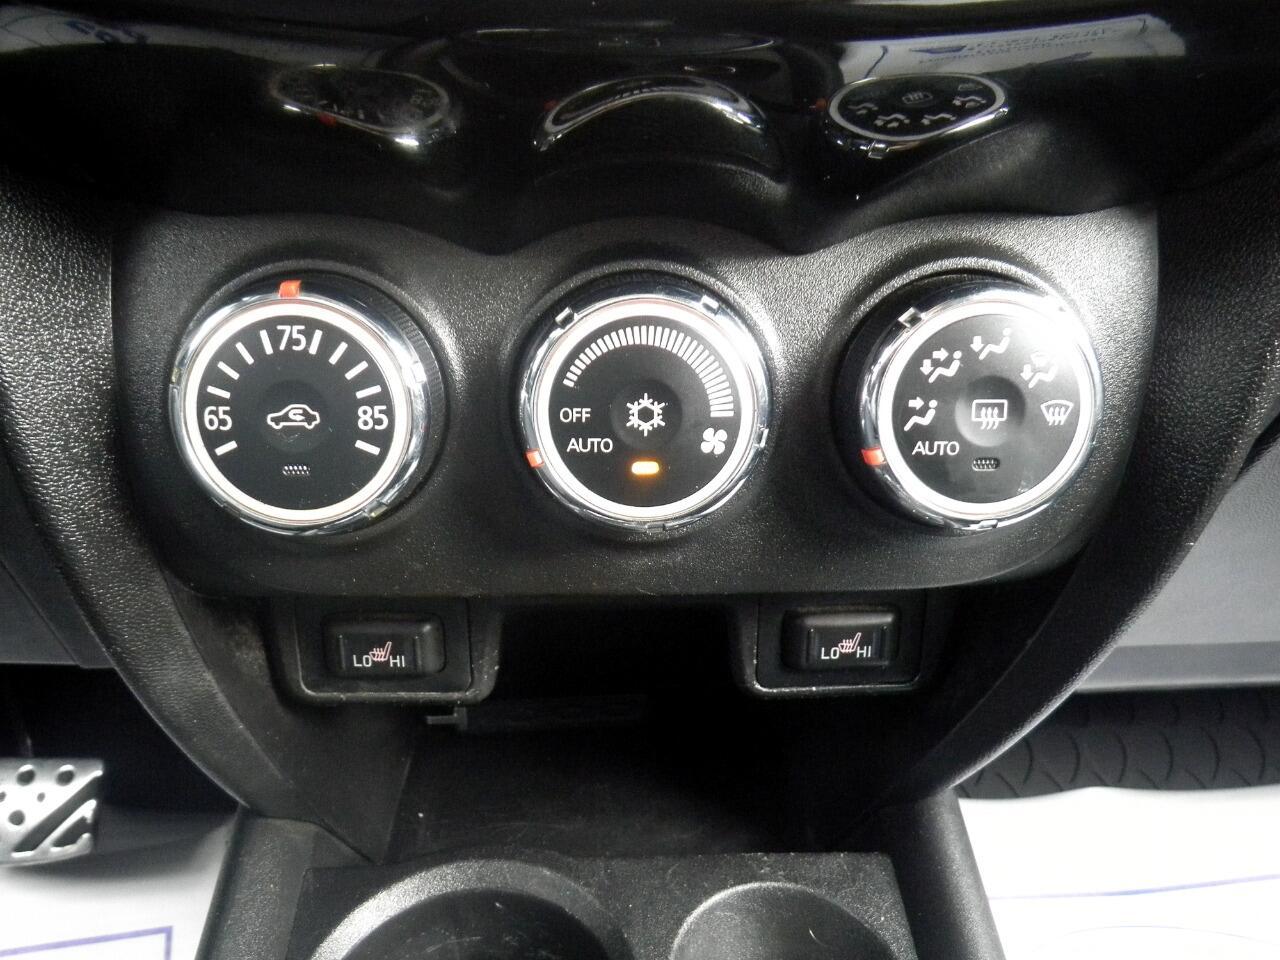 2015 Mitsubishi Outlander Sport AWD 4dr CVT 2.4 GT